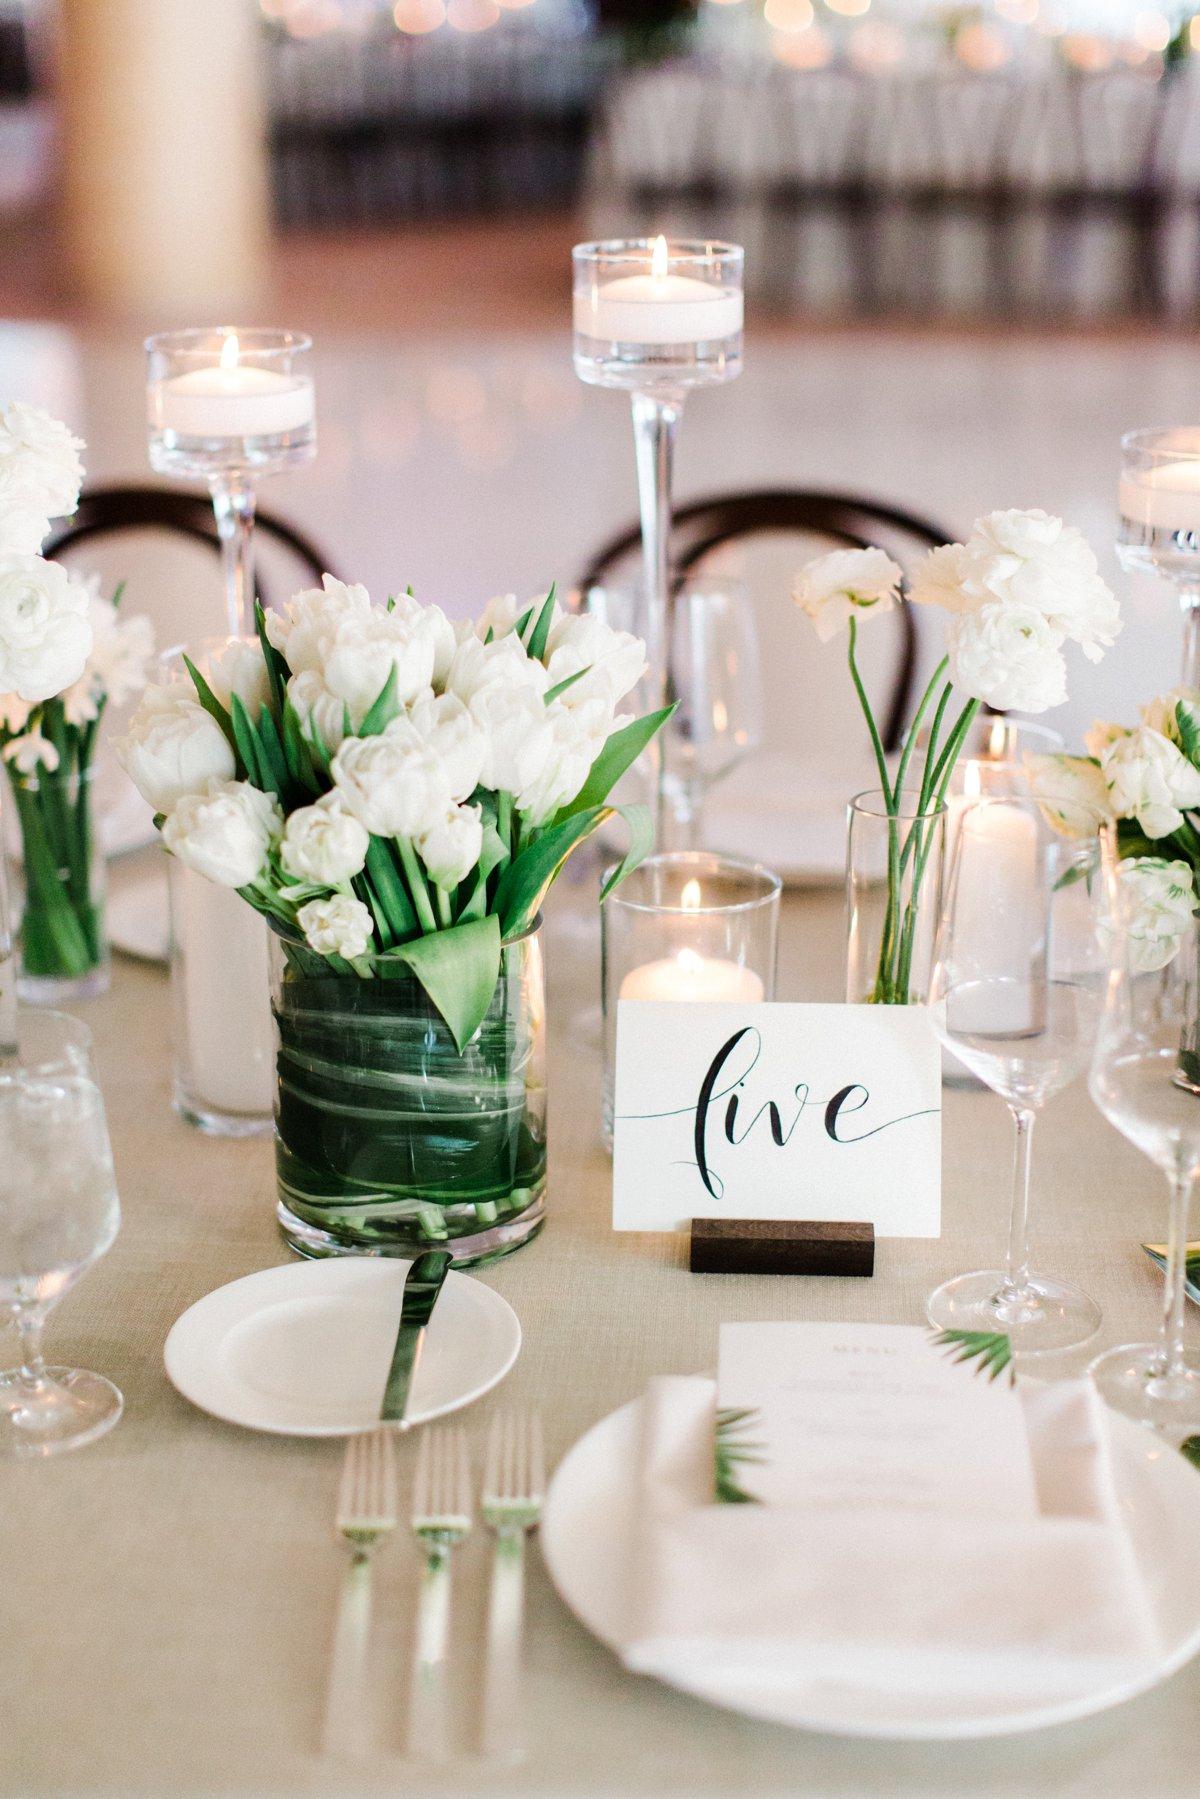 modern wedding receptions - photo by Anna Delores https://ruffledblog.com/chic-modern-wedding-at-four-seasons-santa-barbara